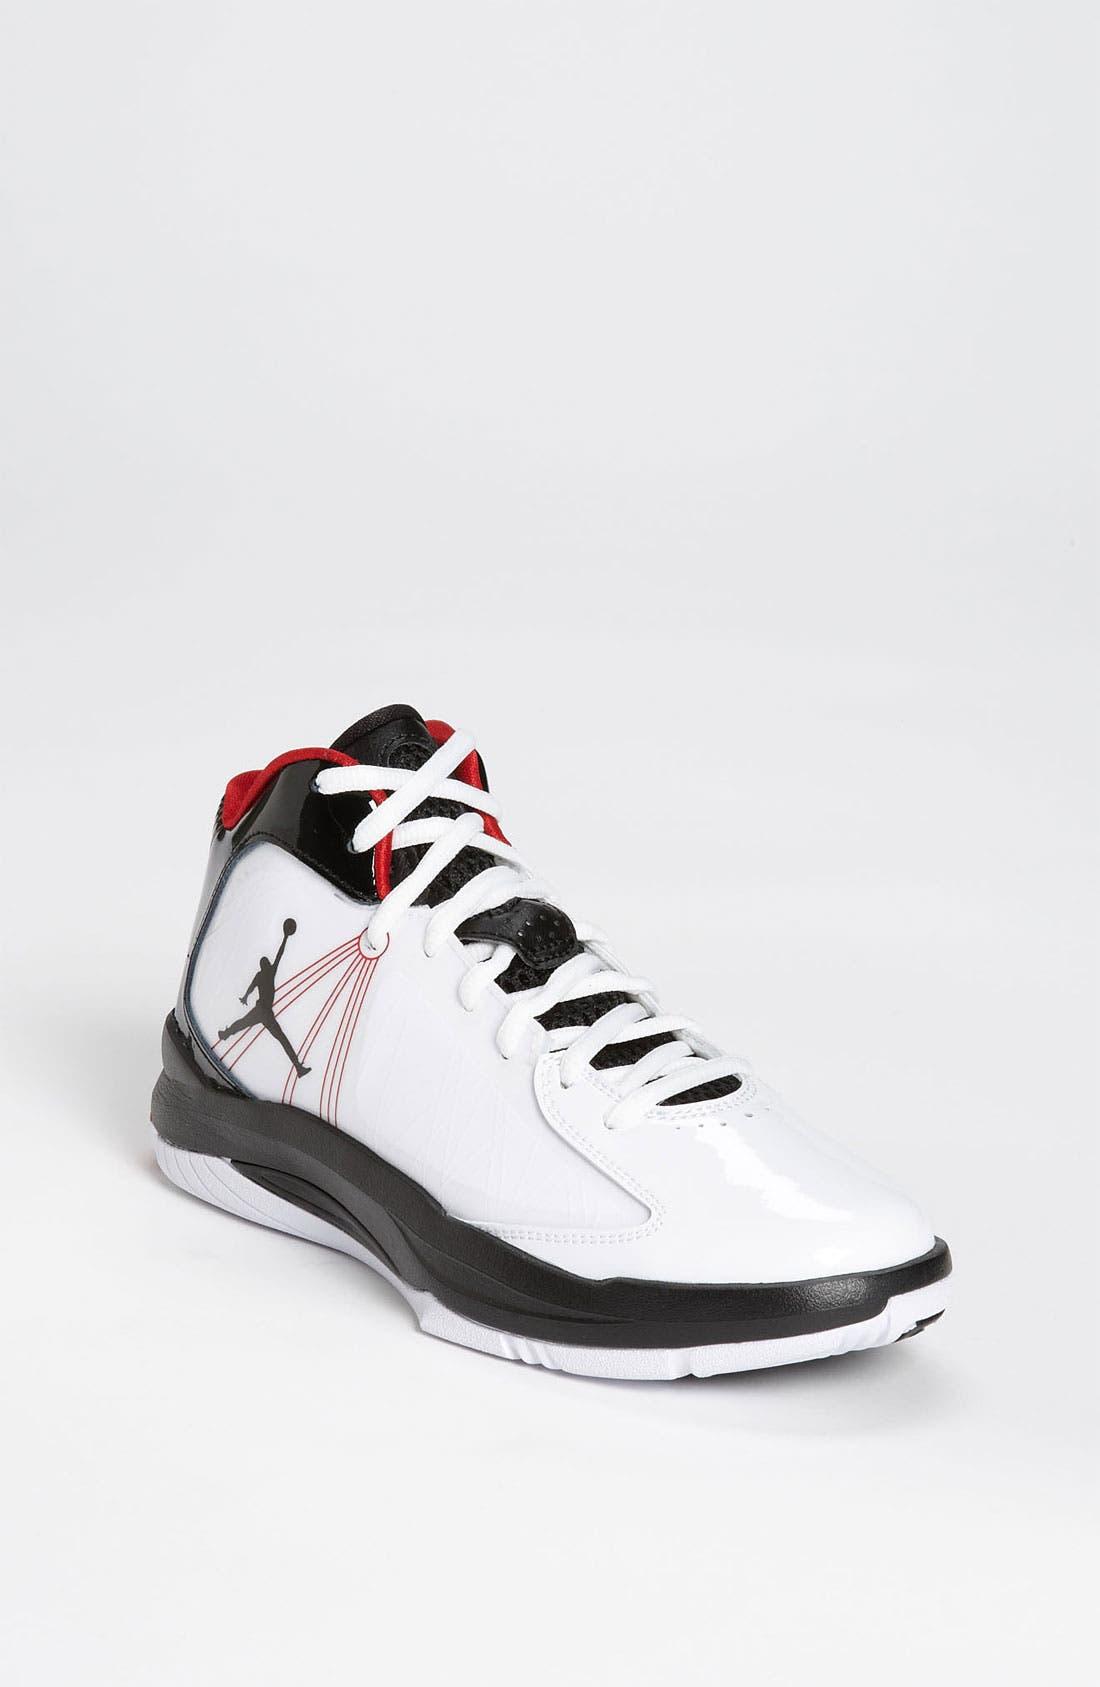 Alternate Image 1 Selected - Nike 'Jordan Aero Flight' Sneaker (Big Kid)